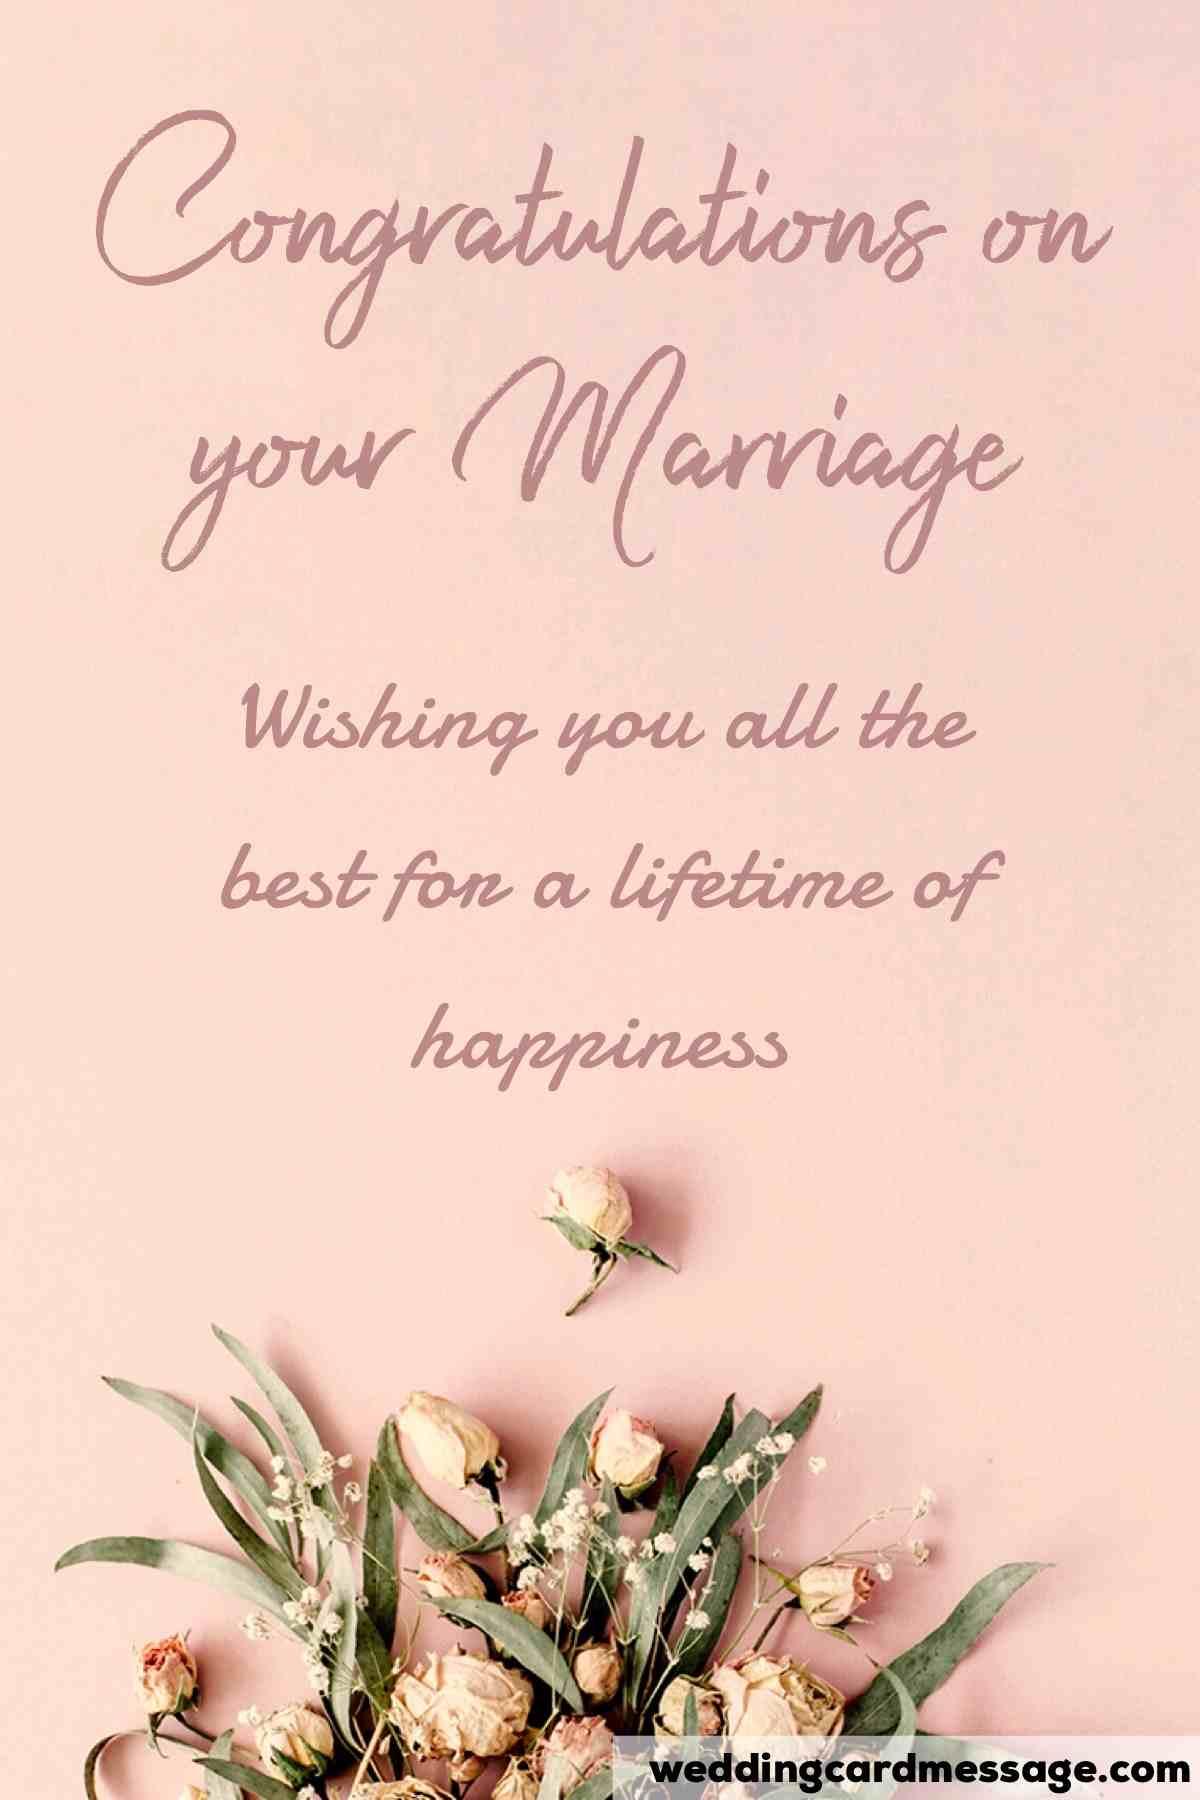 wedding congratulations from parents